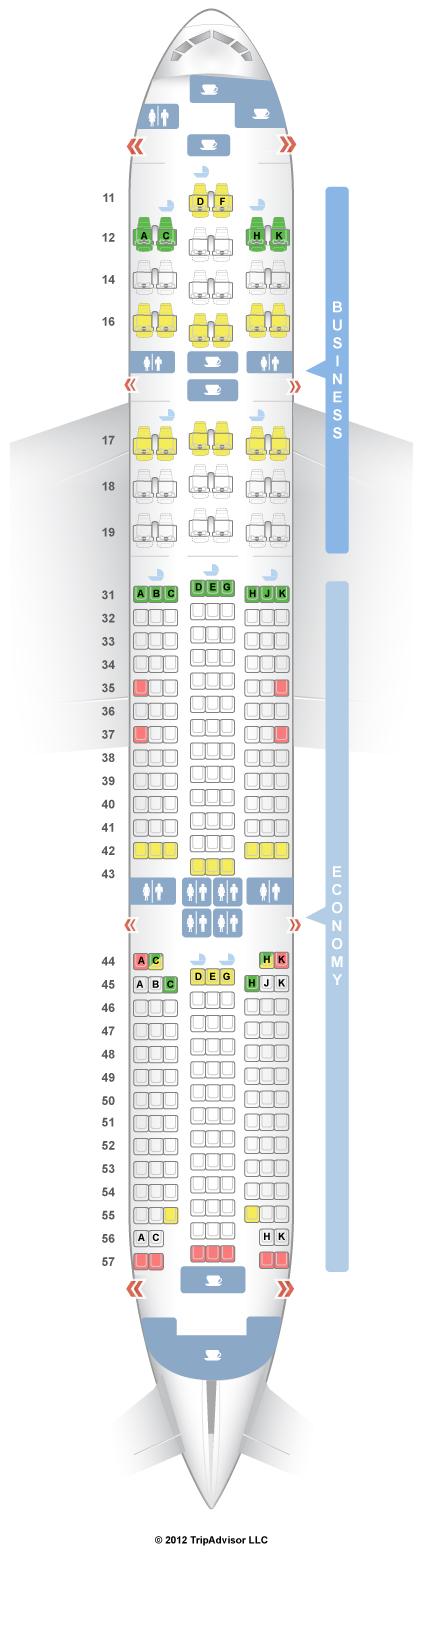 Singapore Bus Map 80 on 777 seat plan, 777 seat diagram, delta a380 seating map, 777 seat profile, 777 seat configuration,